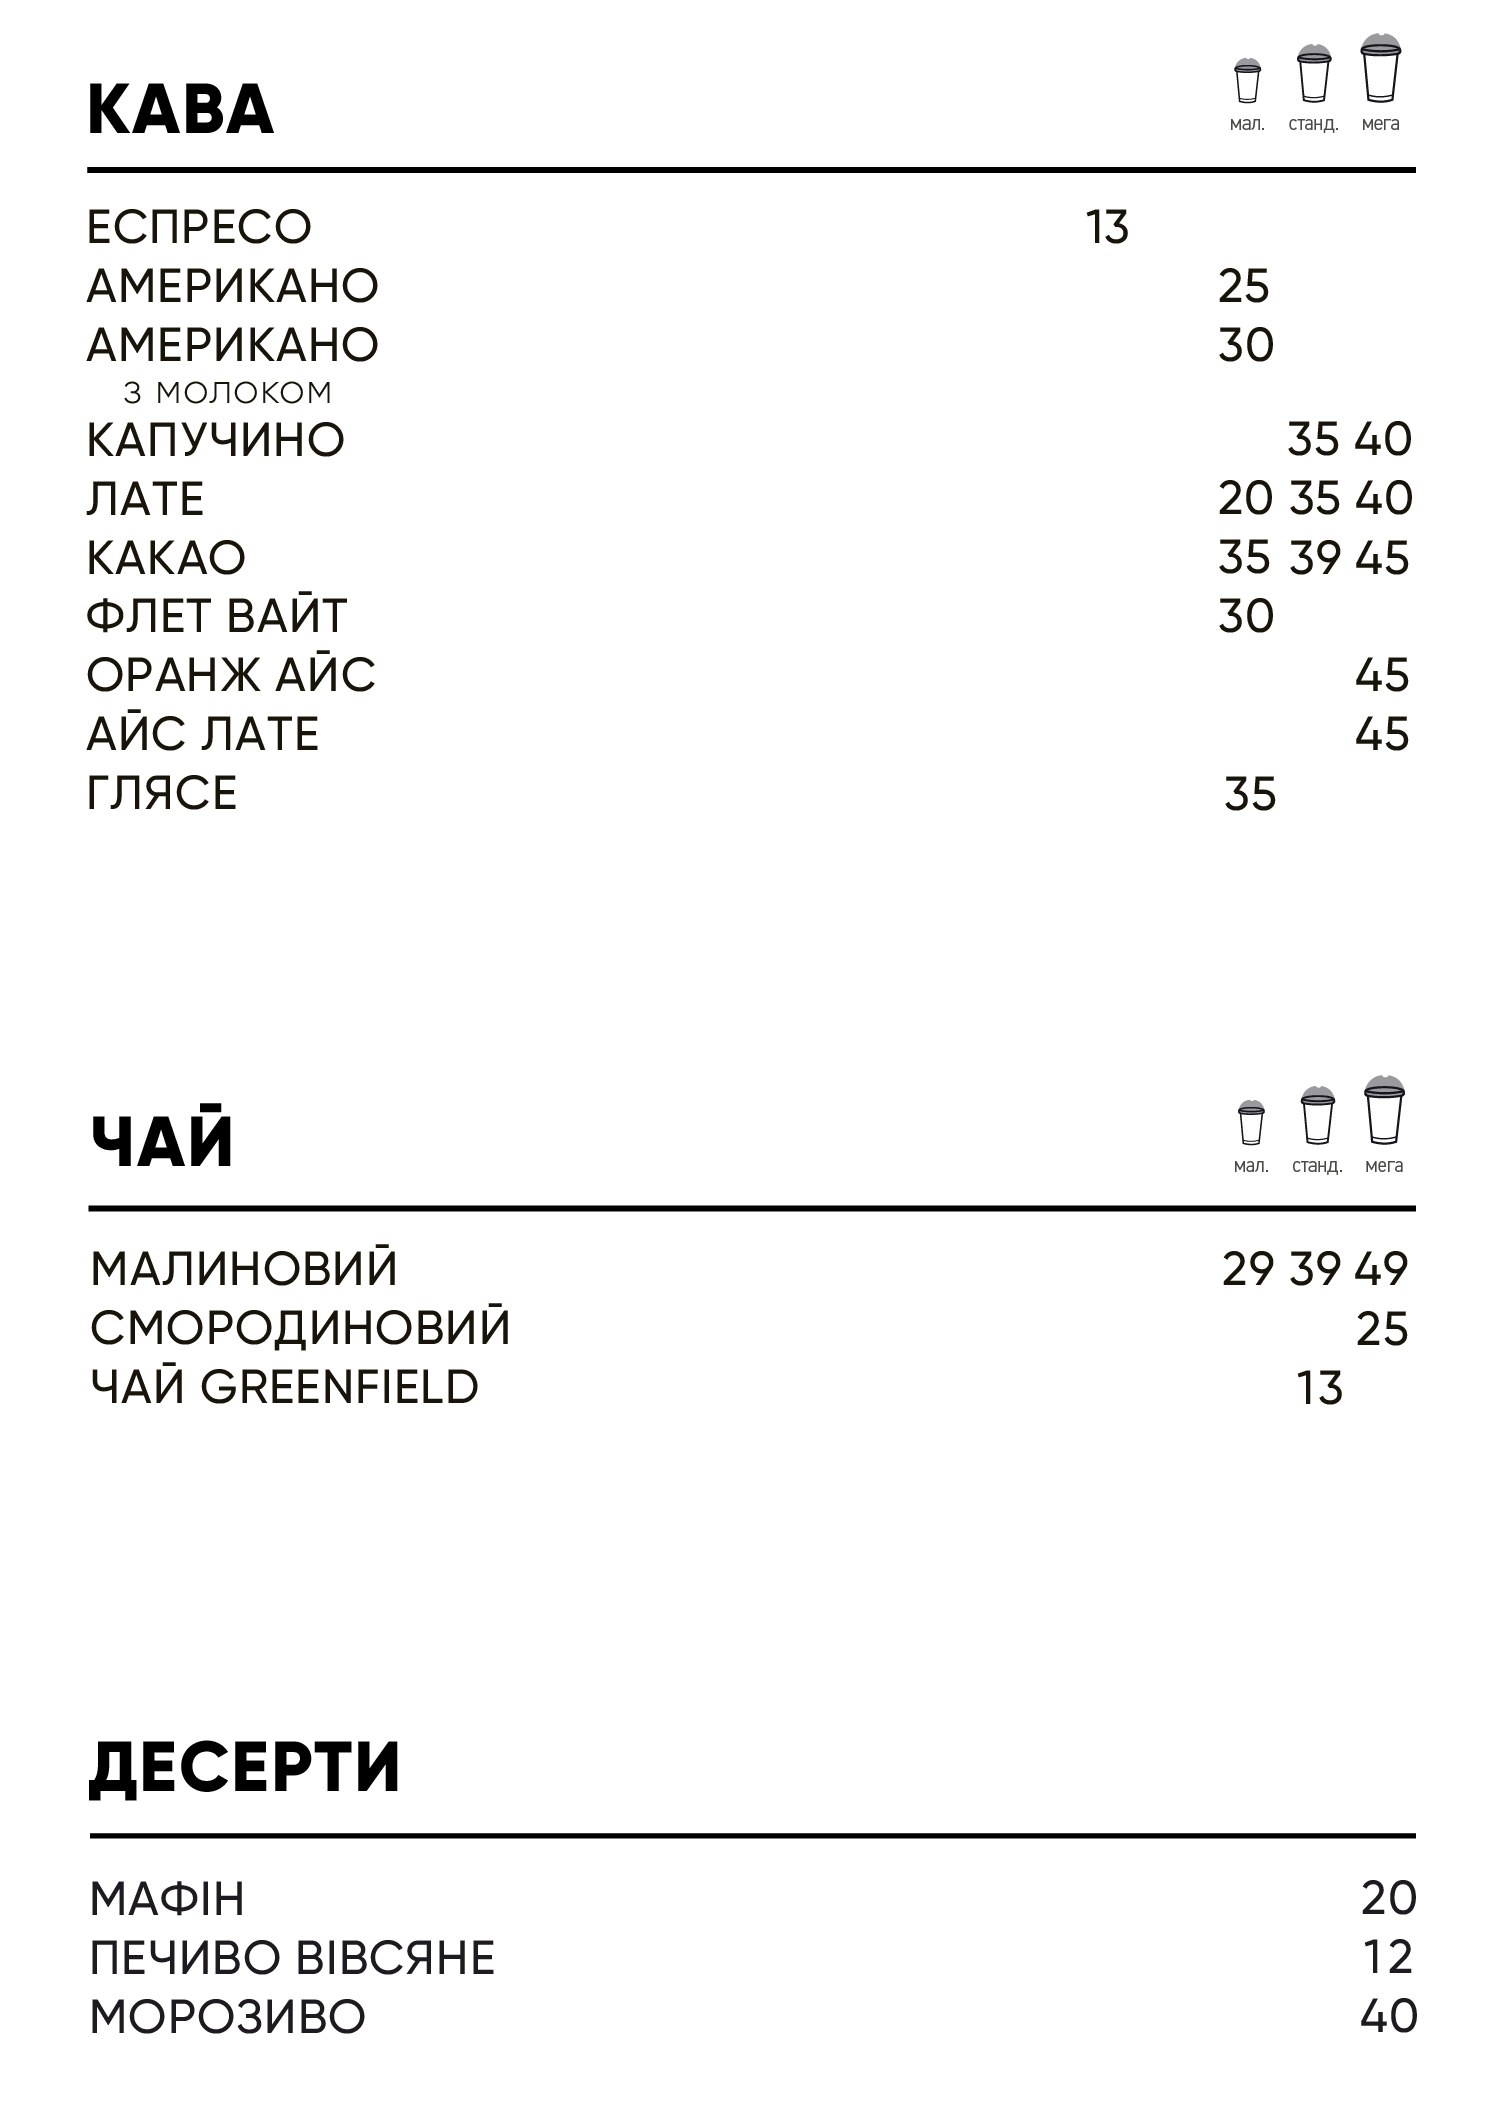 киев_60Х85-04